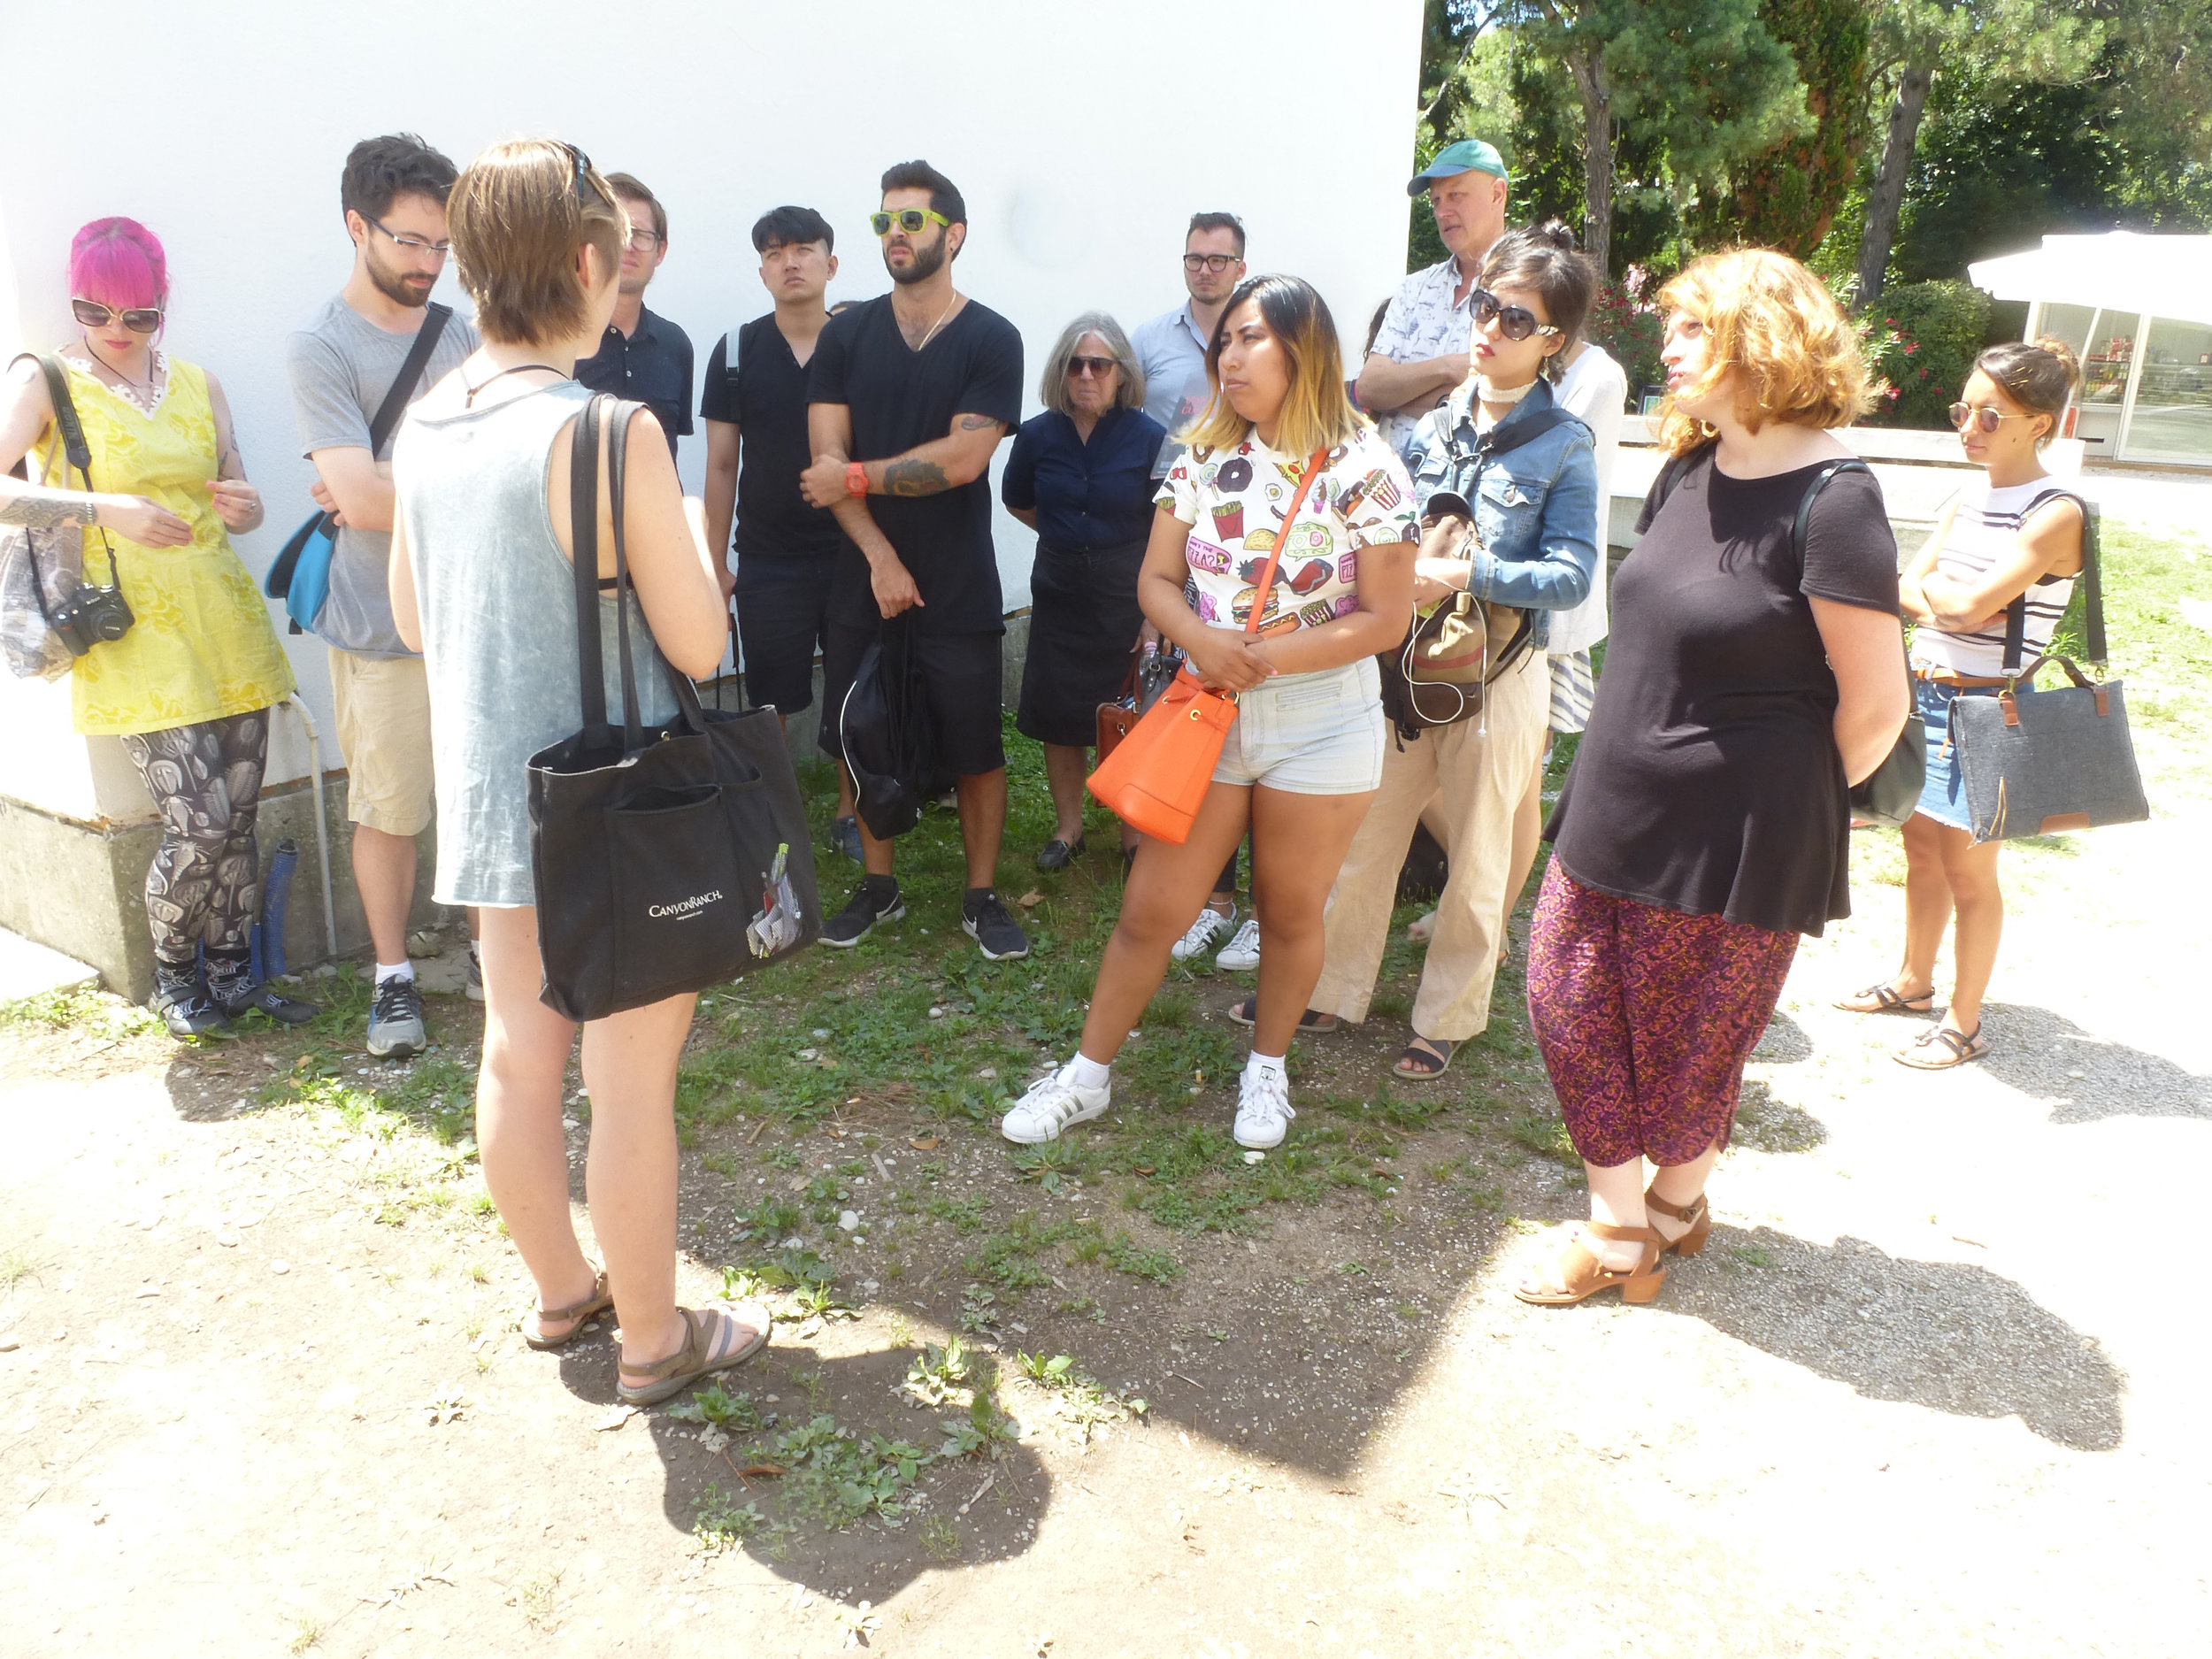 Venice Biennale with the Pratt in Venice Program